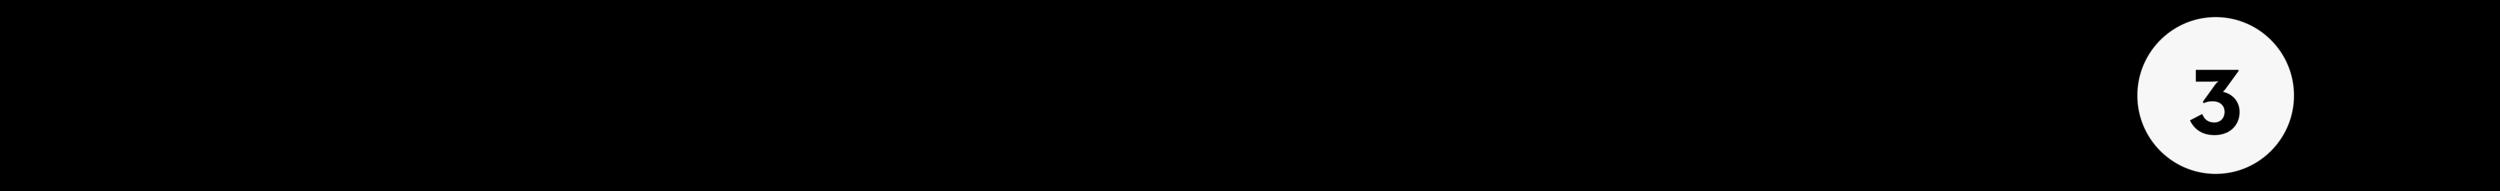 LineBreak 01 (3).png